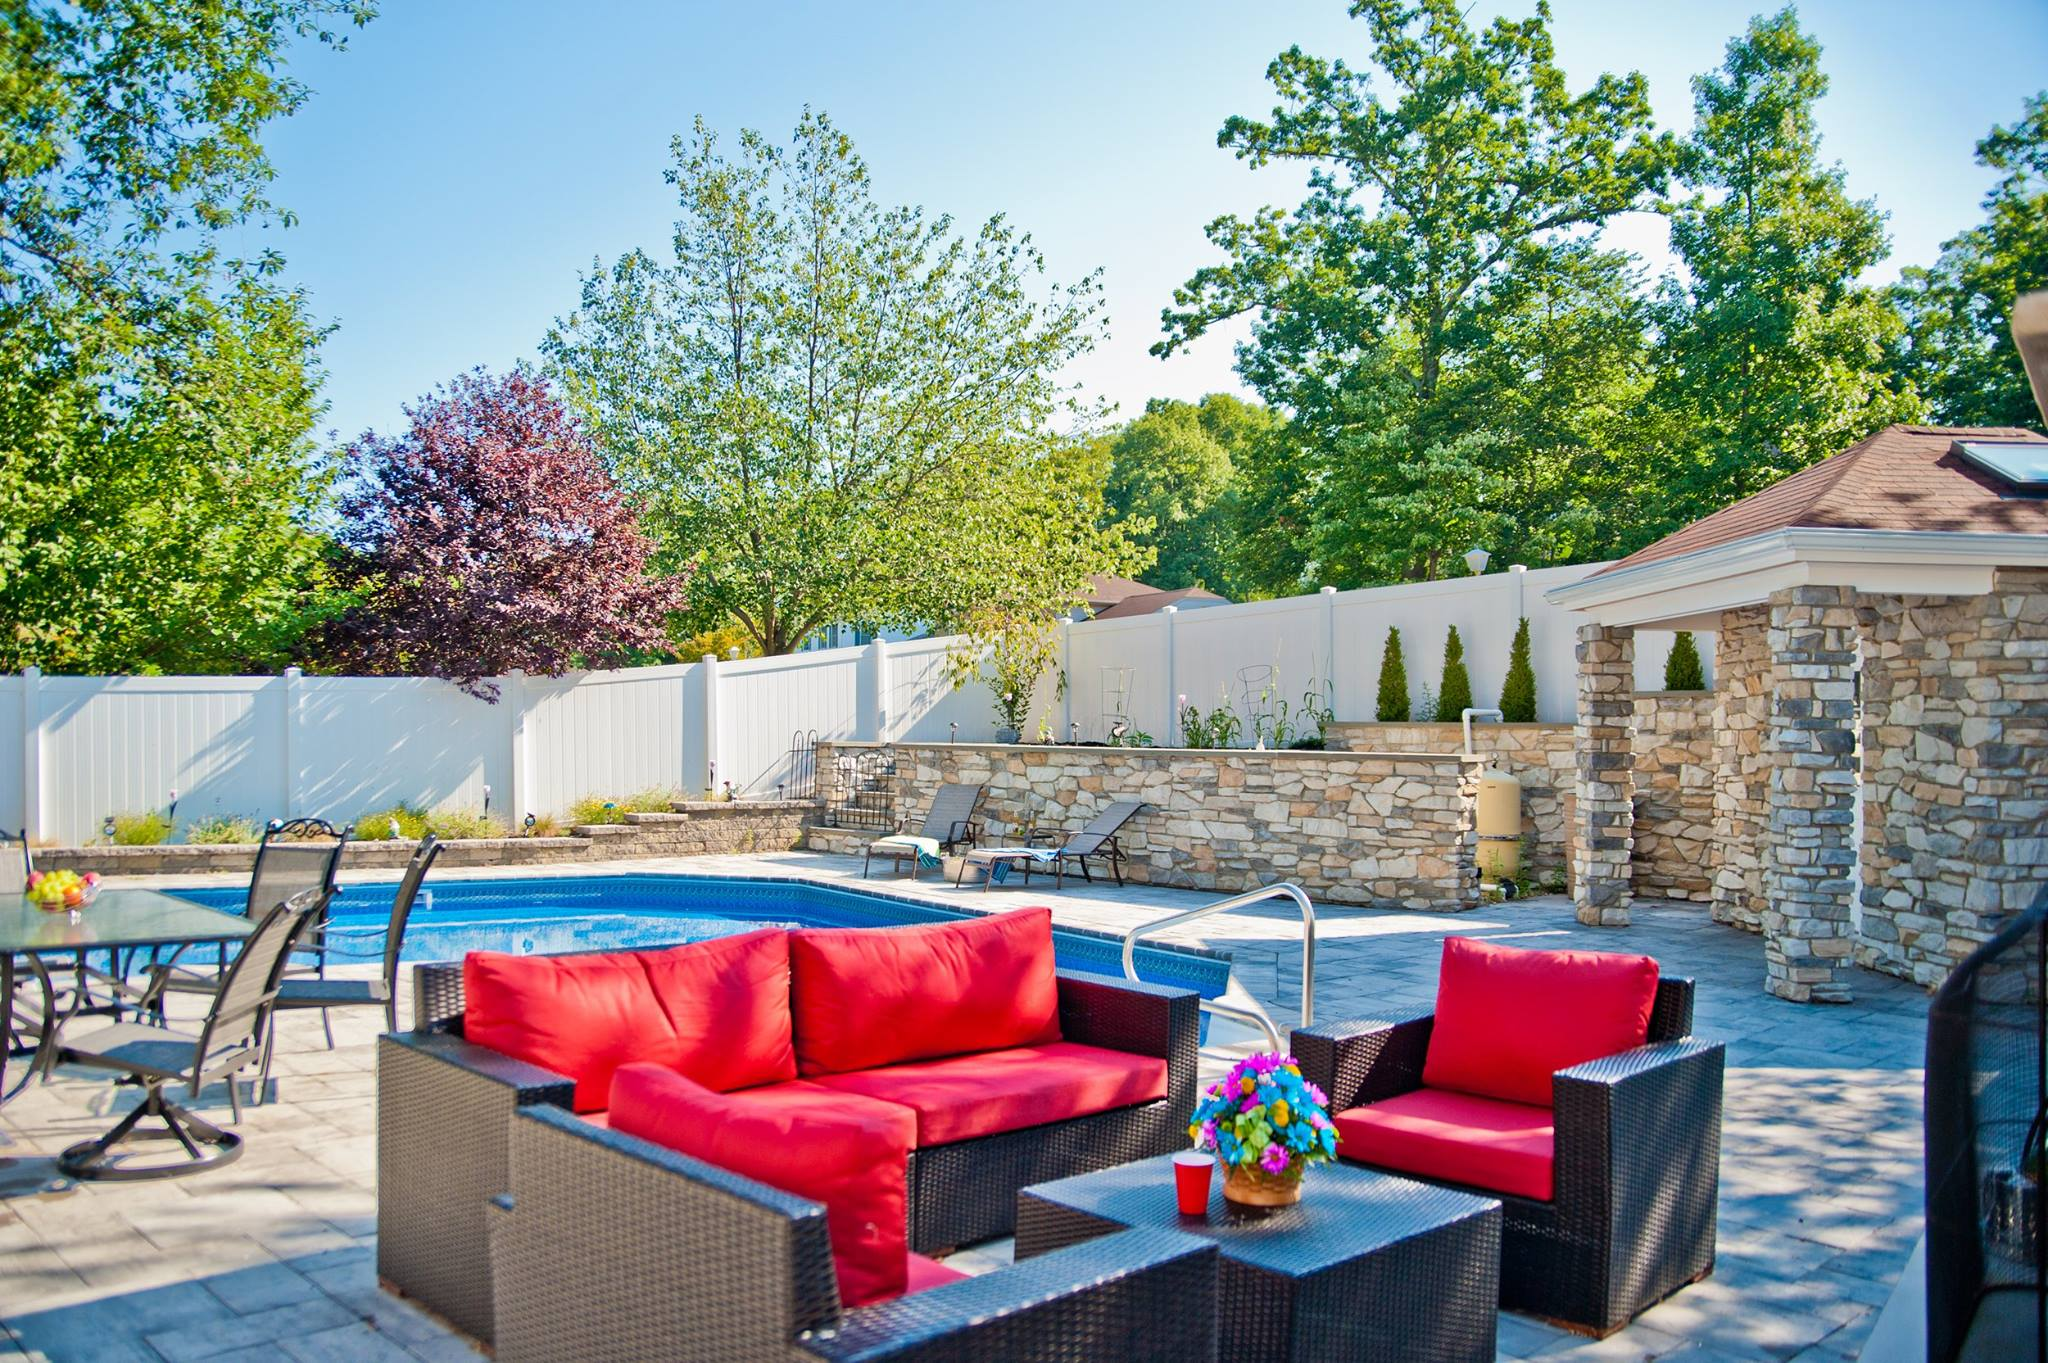 creating a backyard oasis in suburban new jersey